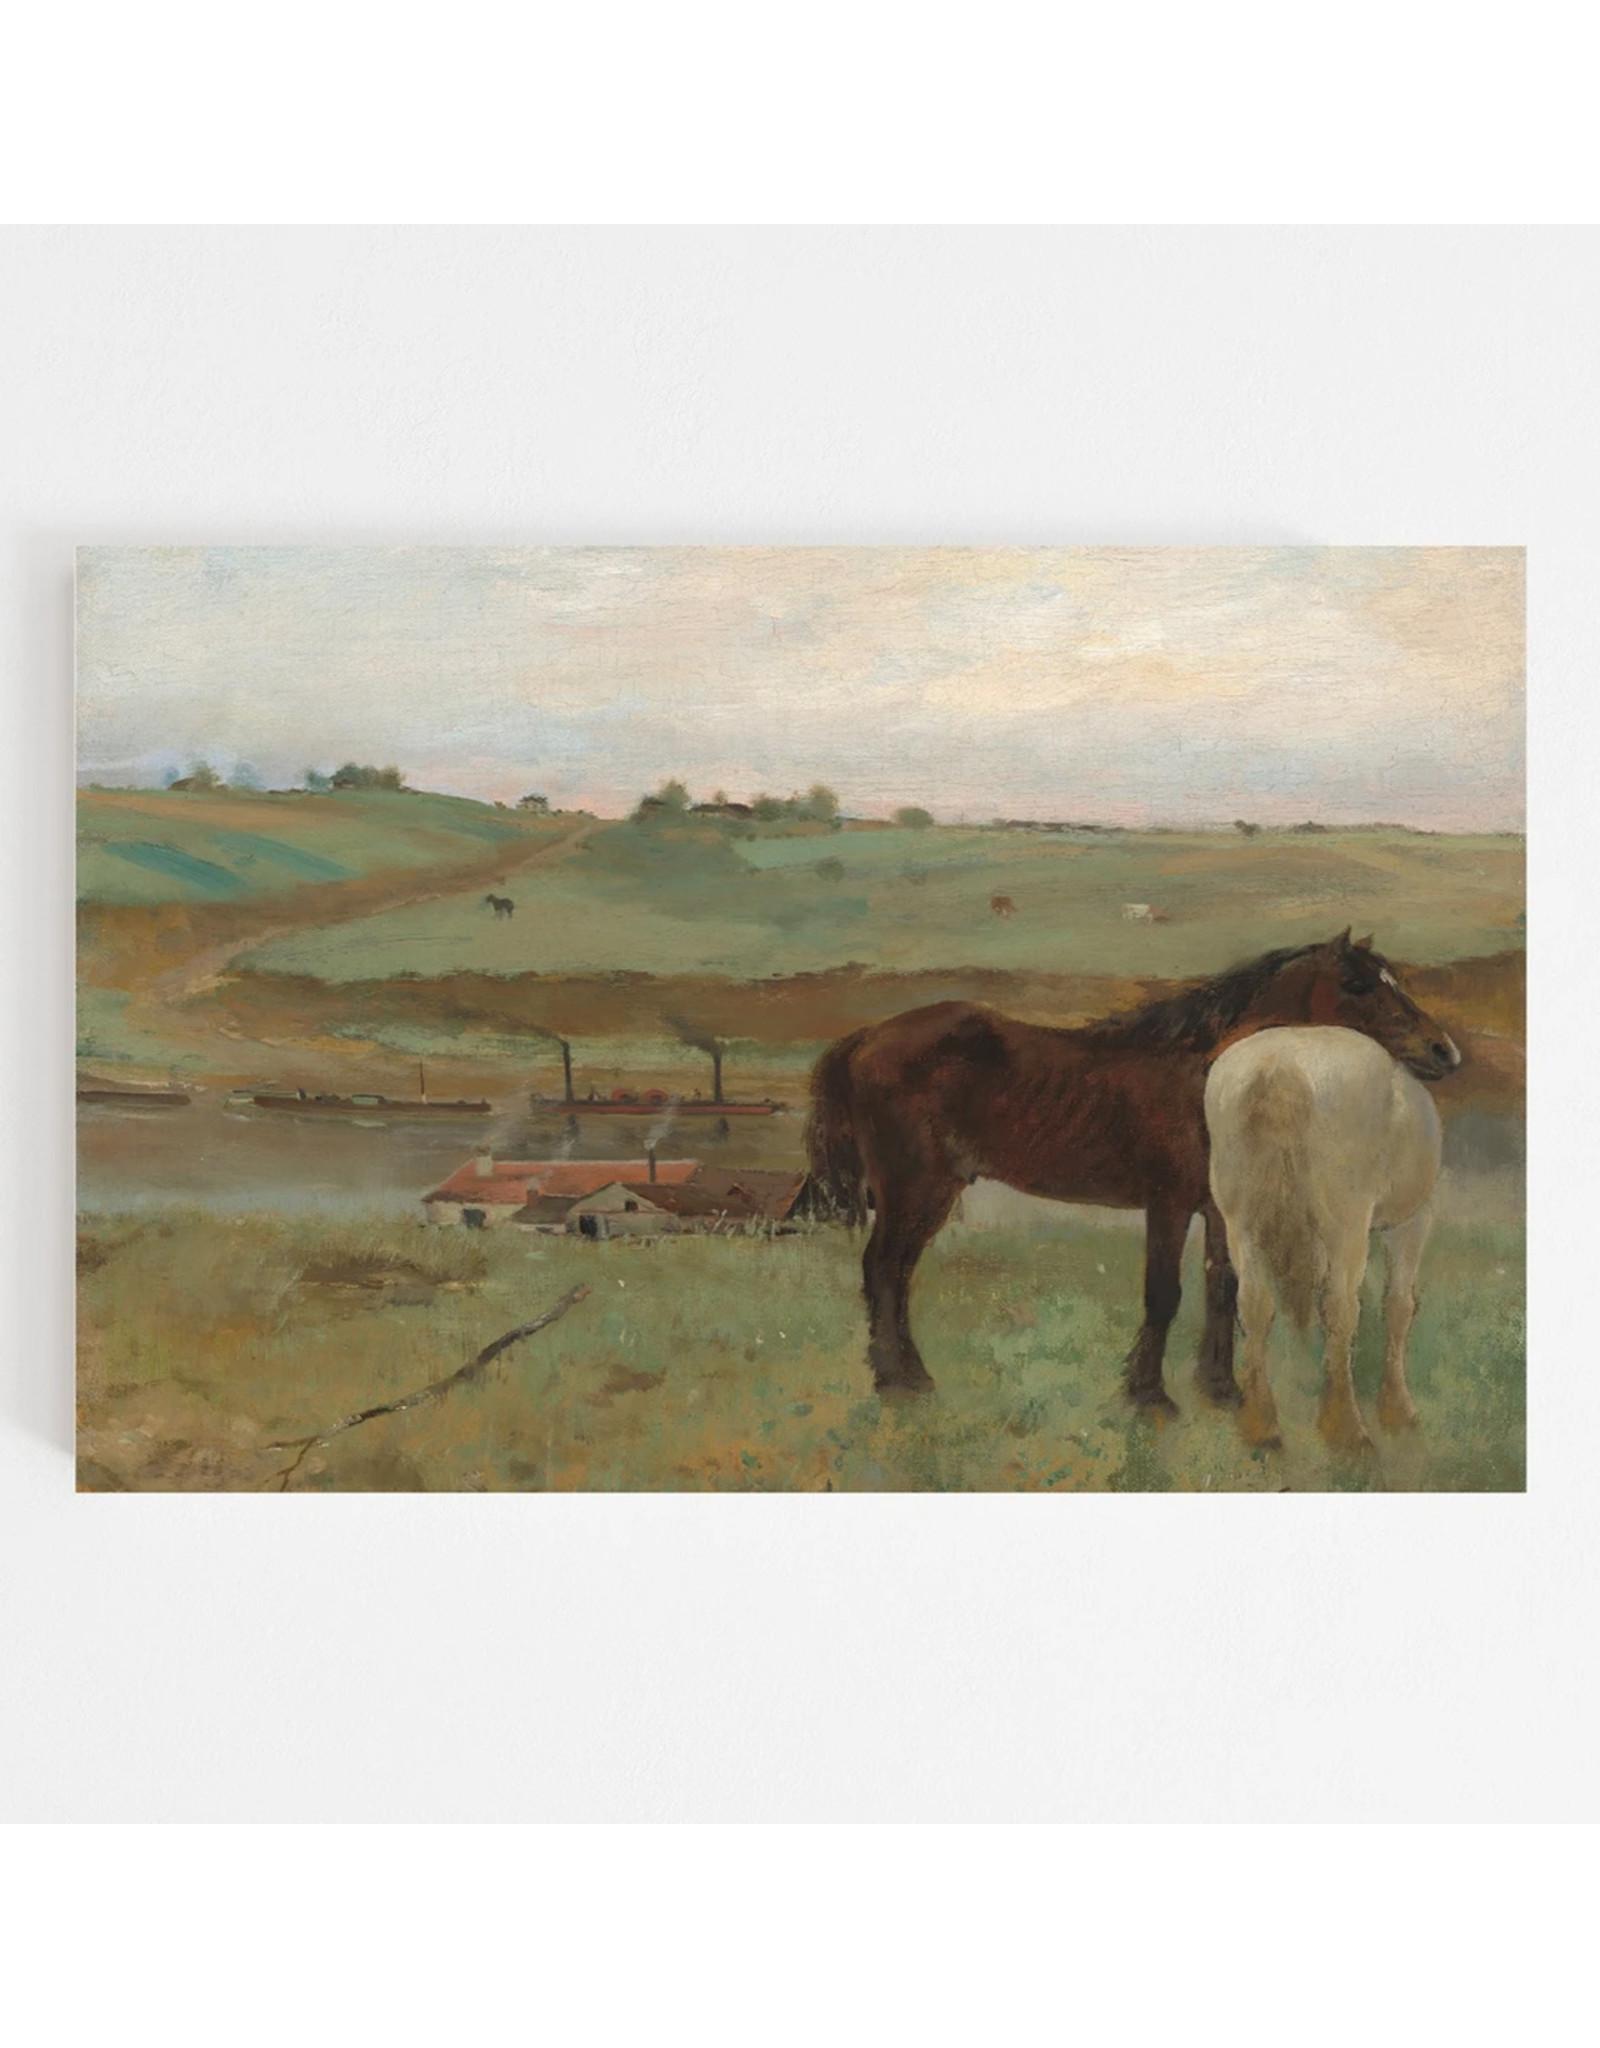 Vintage Print - Horse